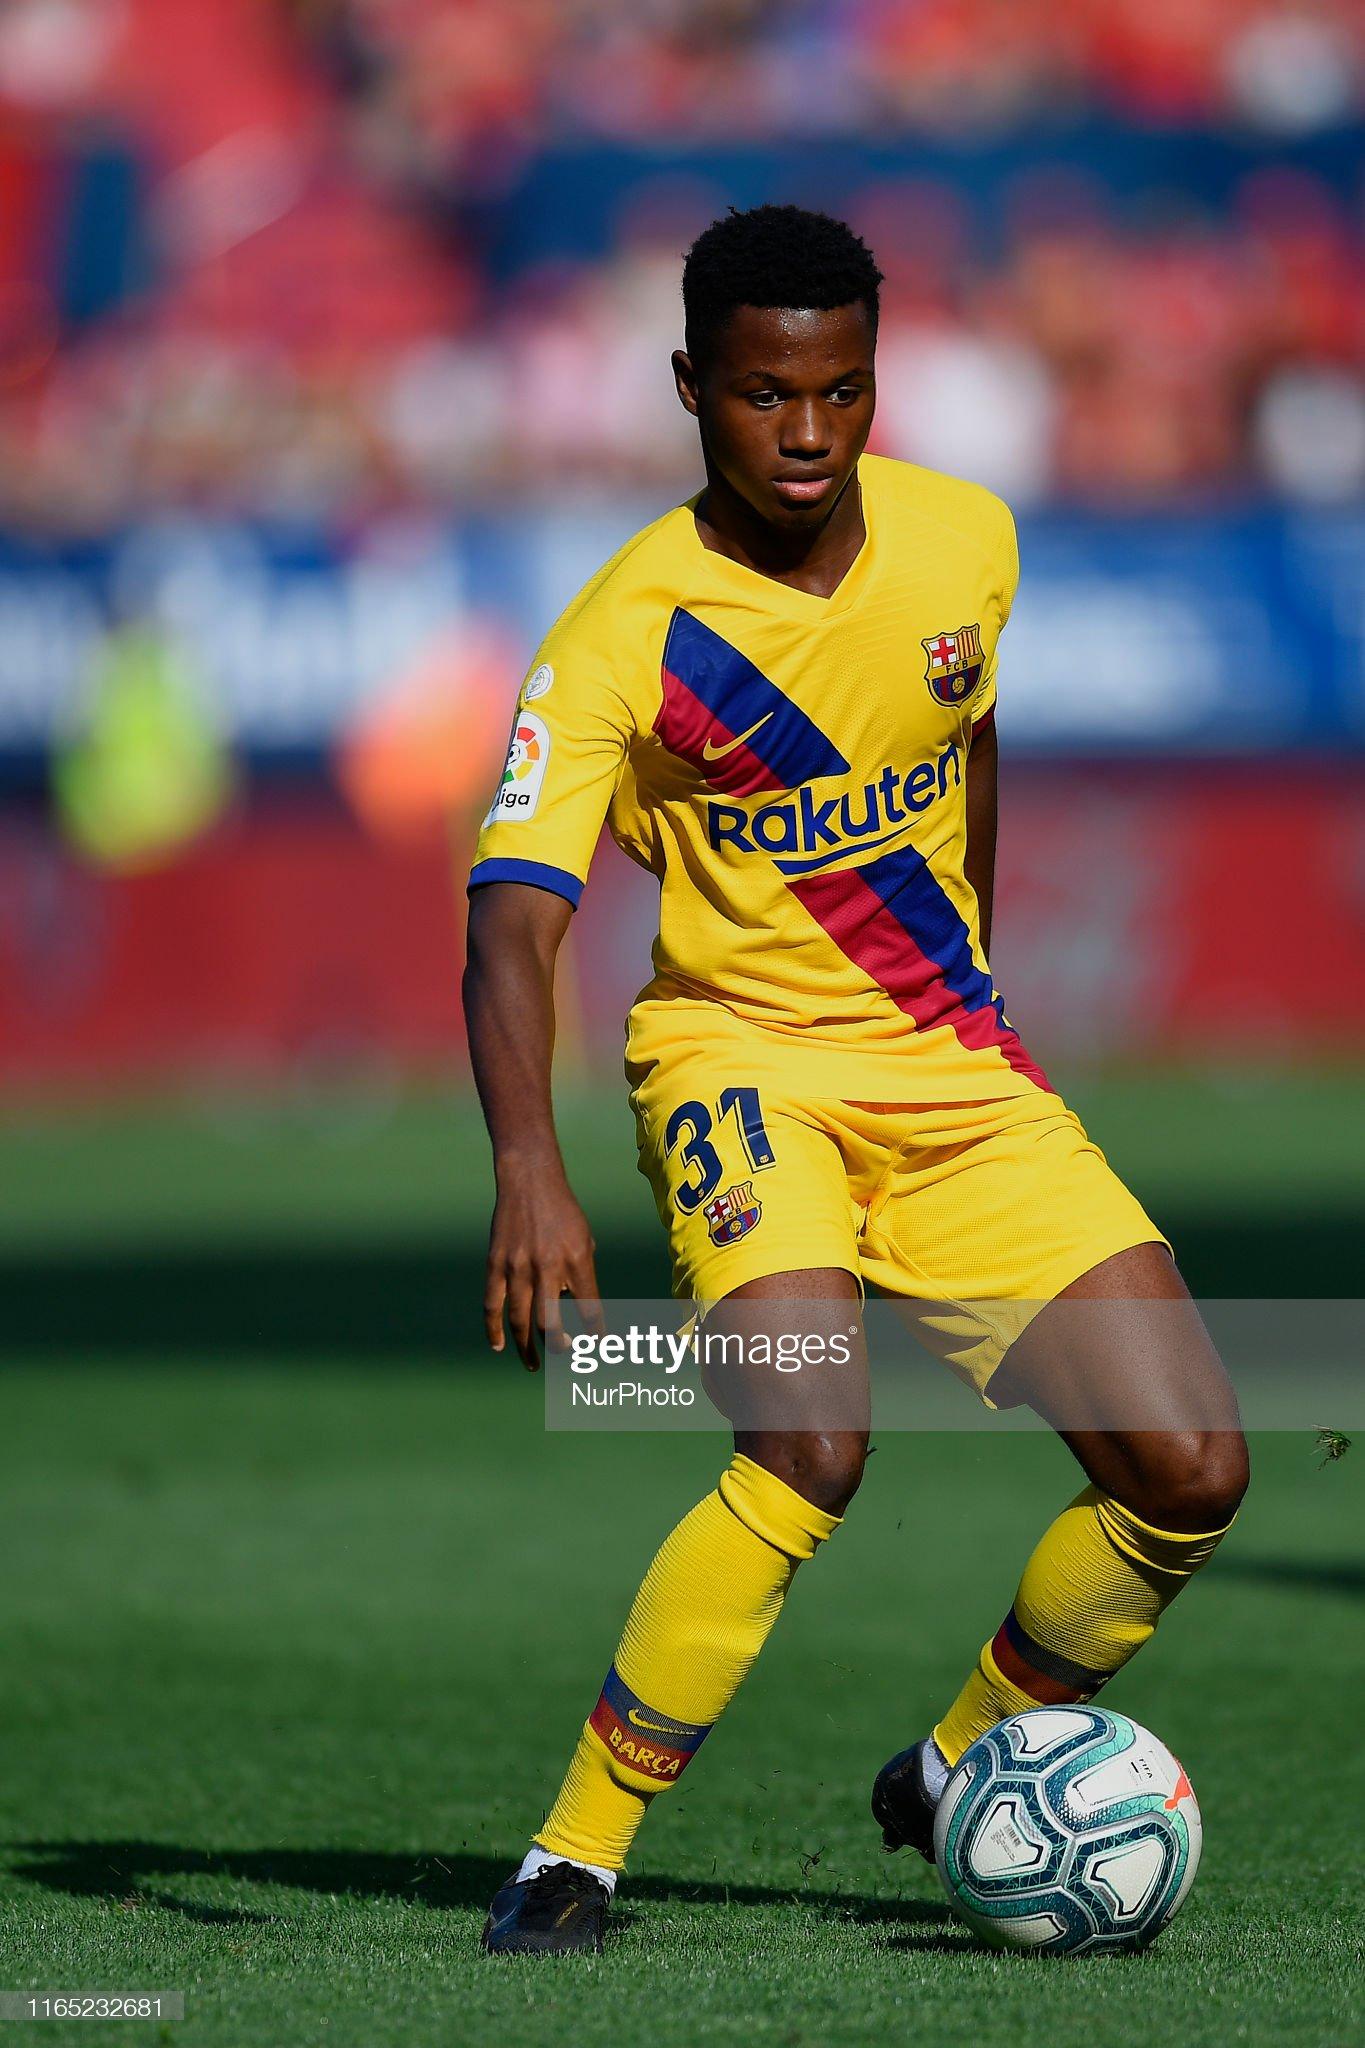 صور مباراة : أوساسونا - برشلونة 2-2 ( 31-08-2019 )  Ansu-fati-of-barcelona-in-action-during-the-liga-match-between-ca-picture-id1165232681?s=2048x2048